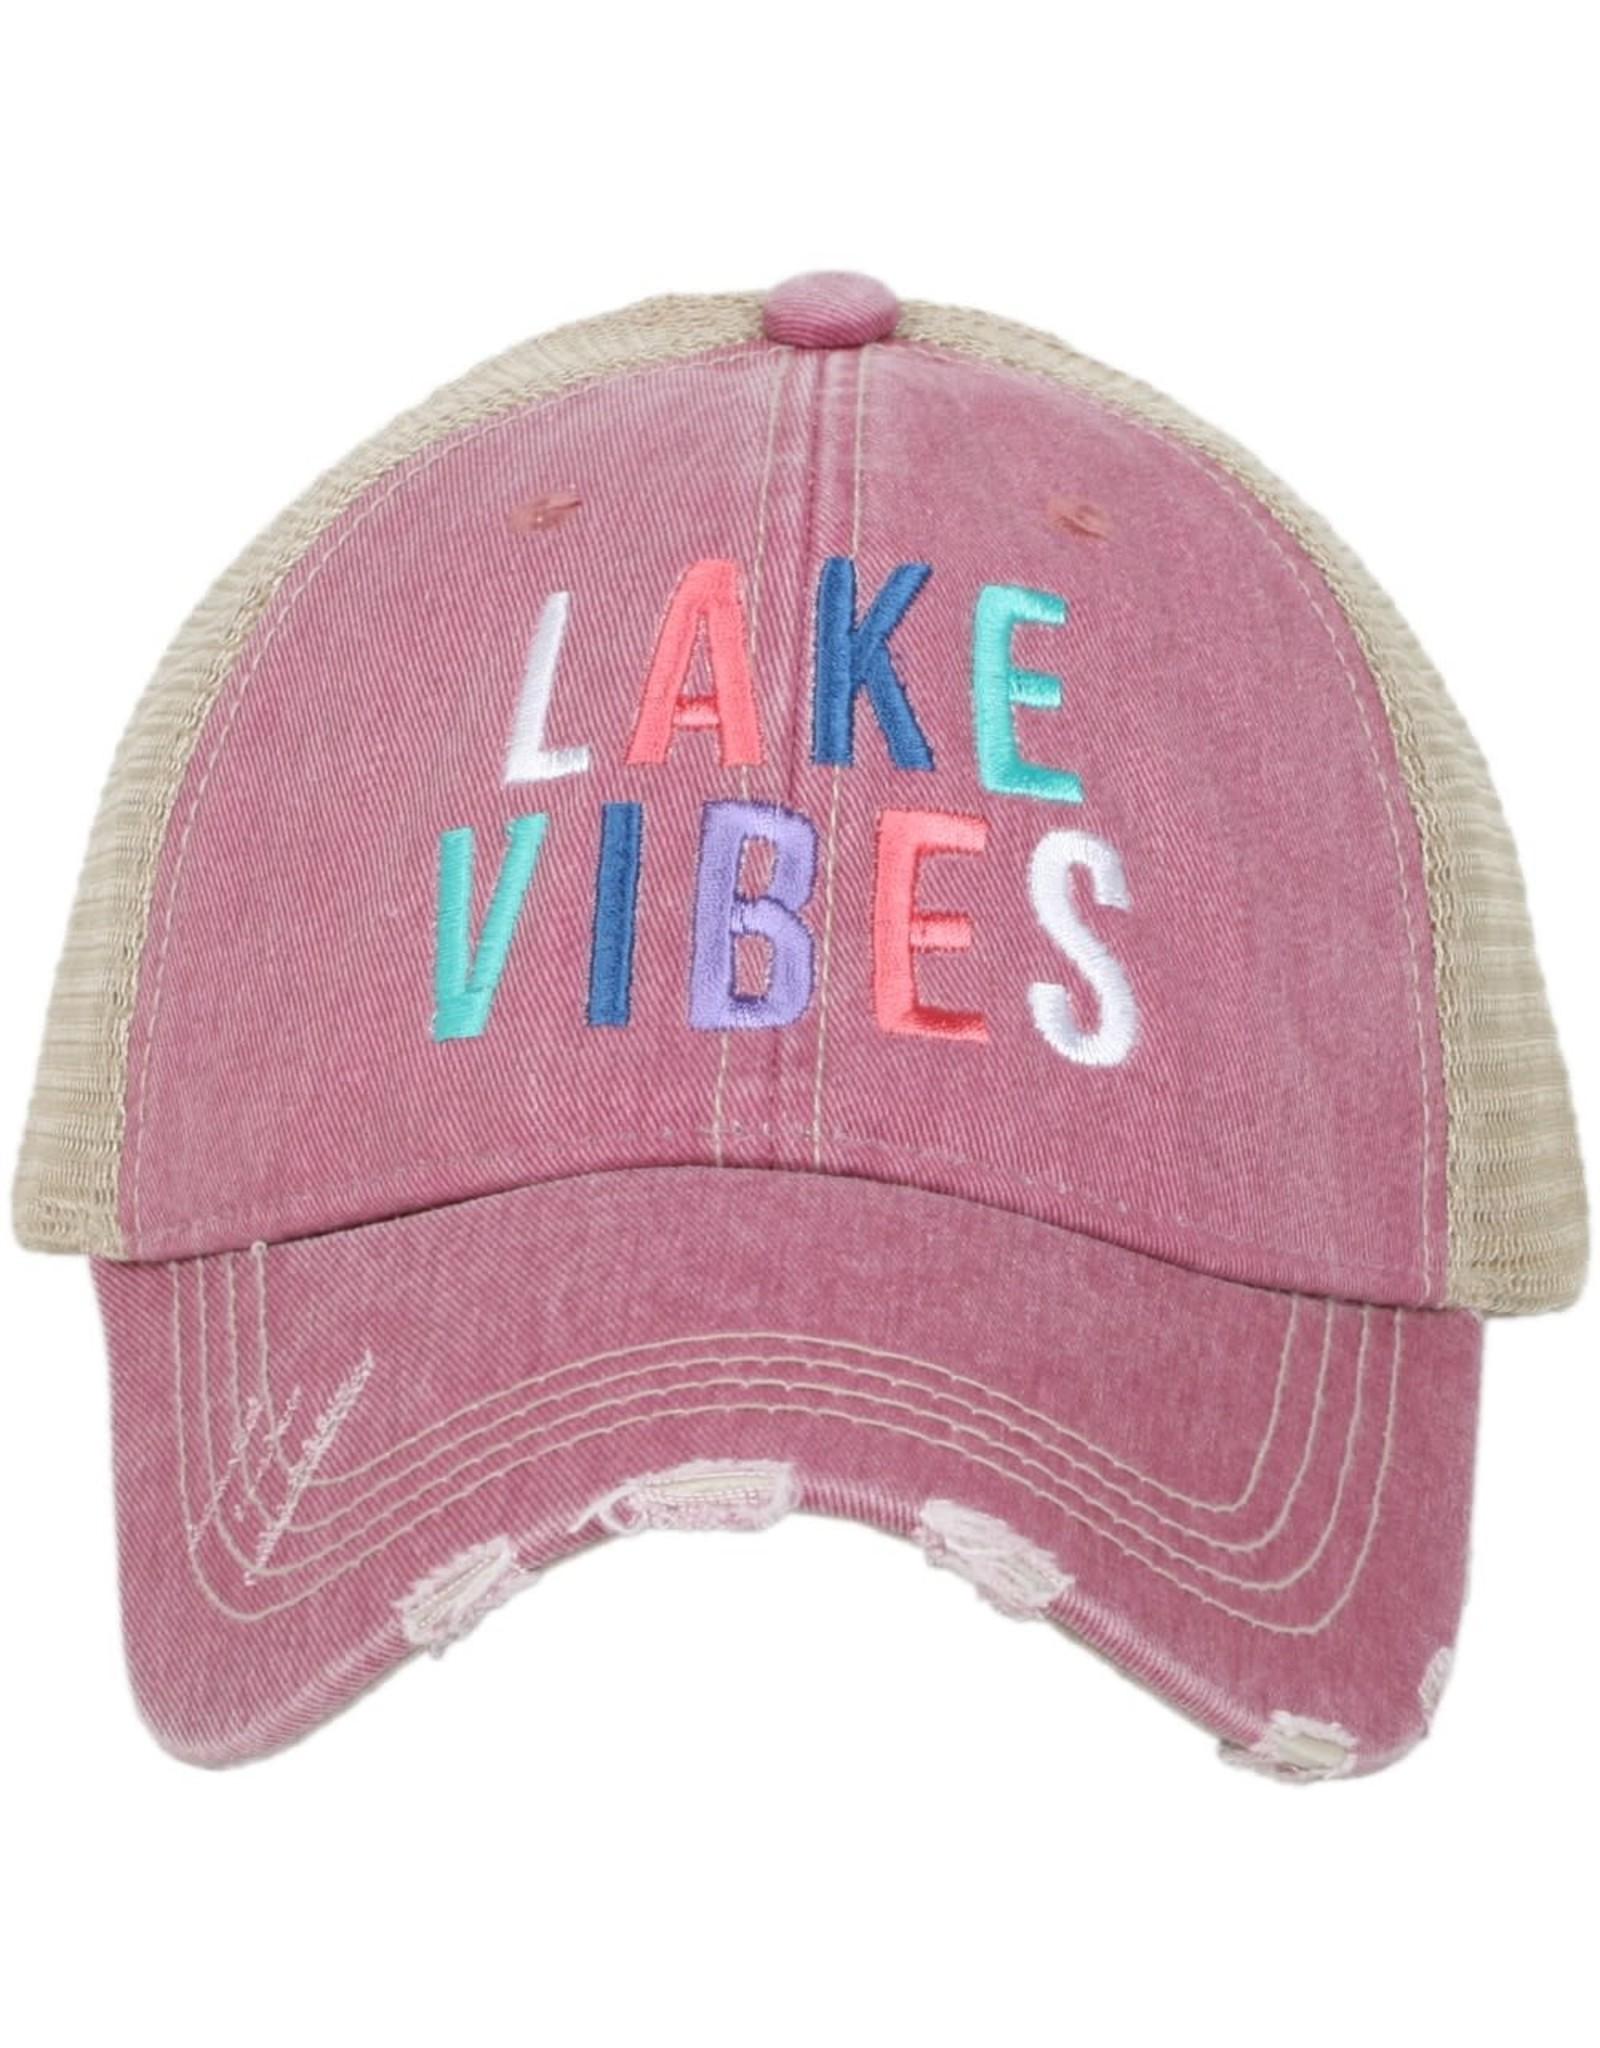 TLC LAKE VIBES  TRUCKER HAT